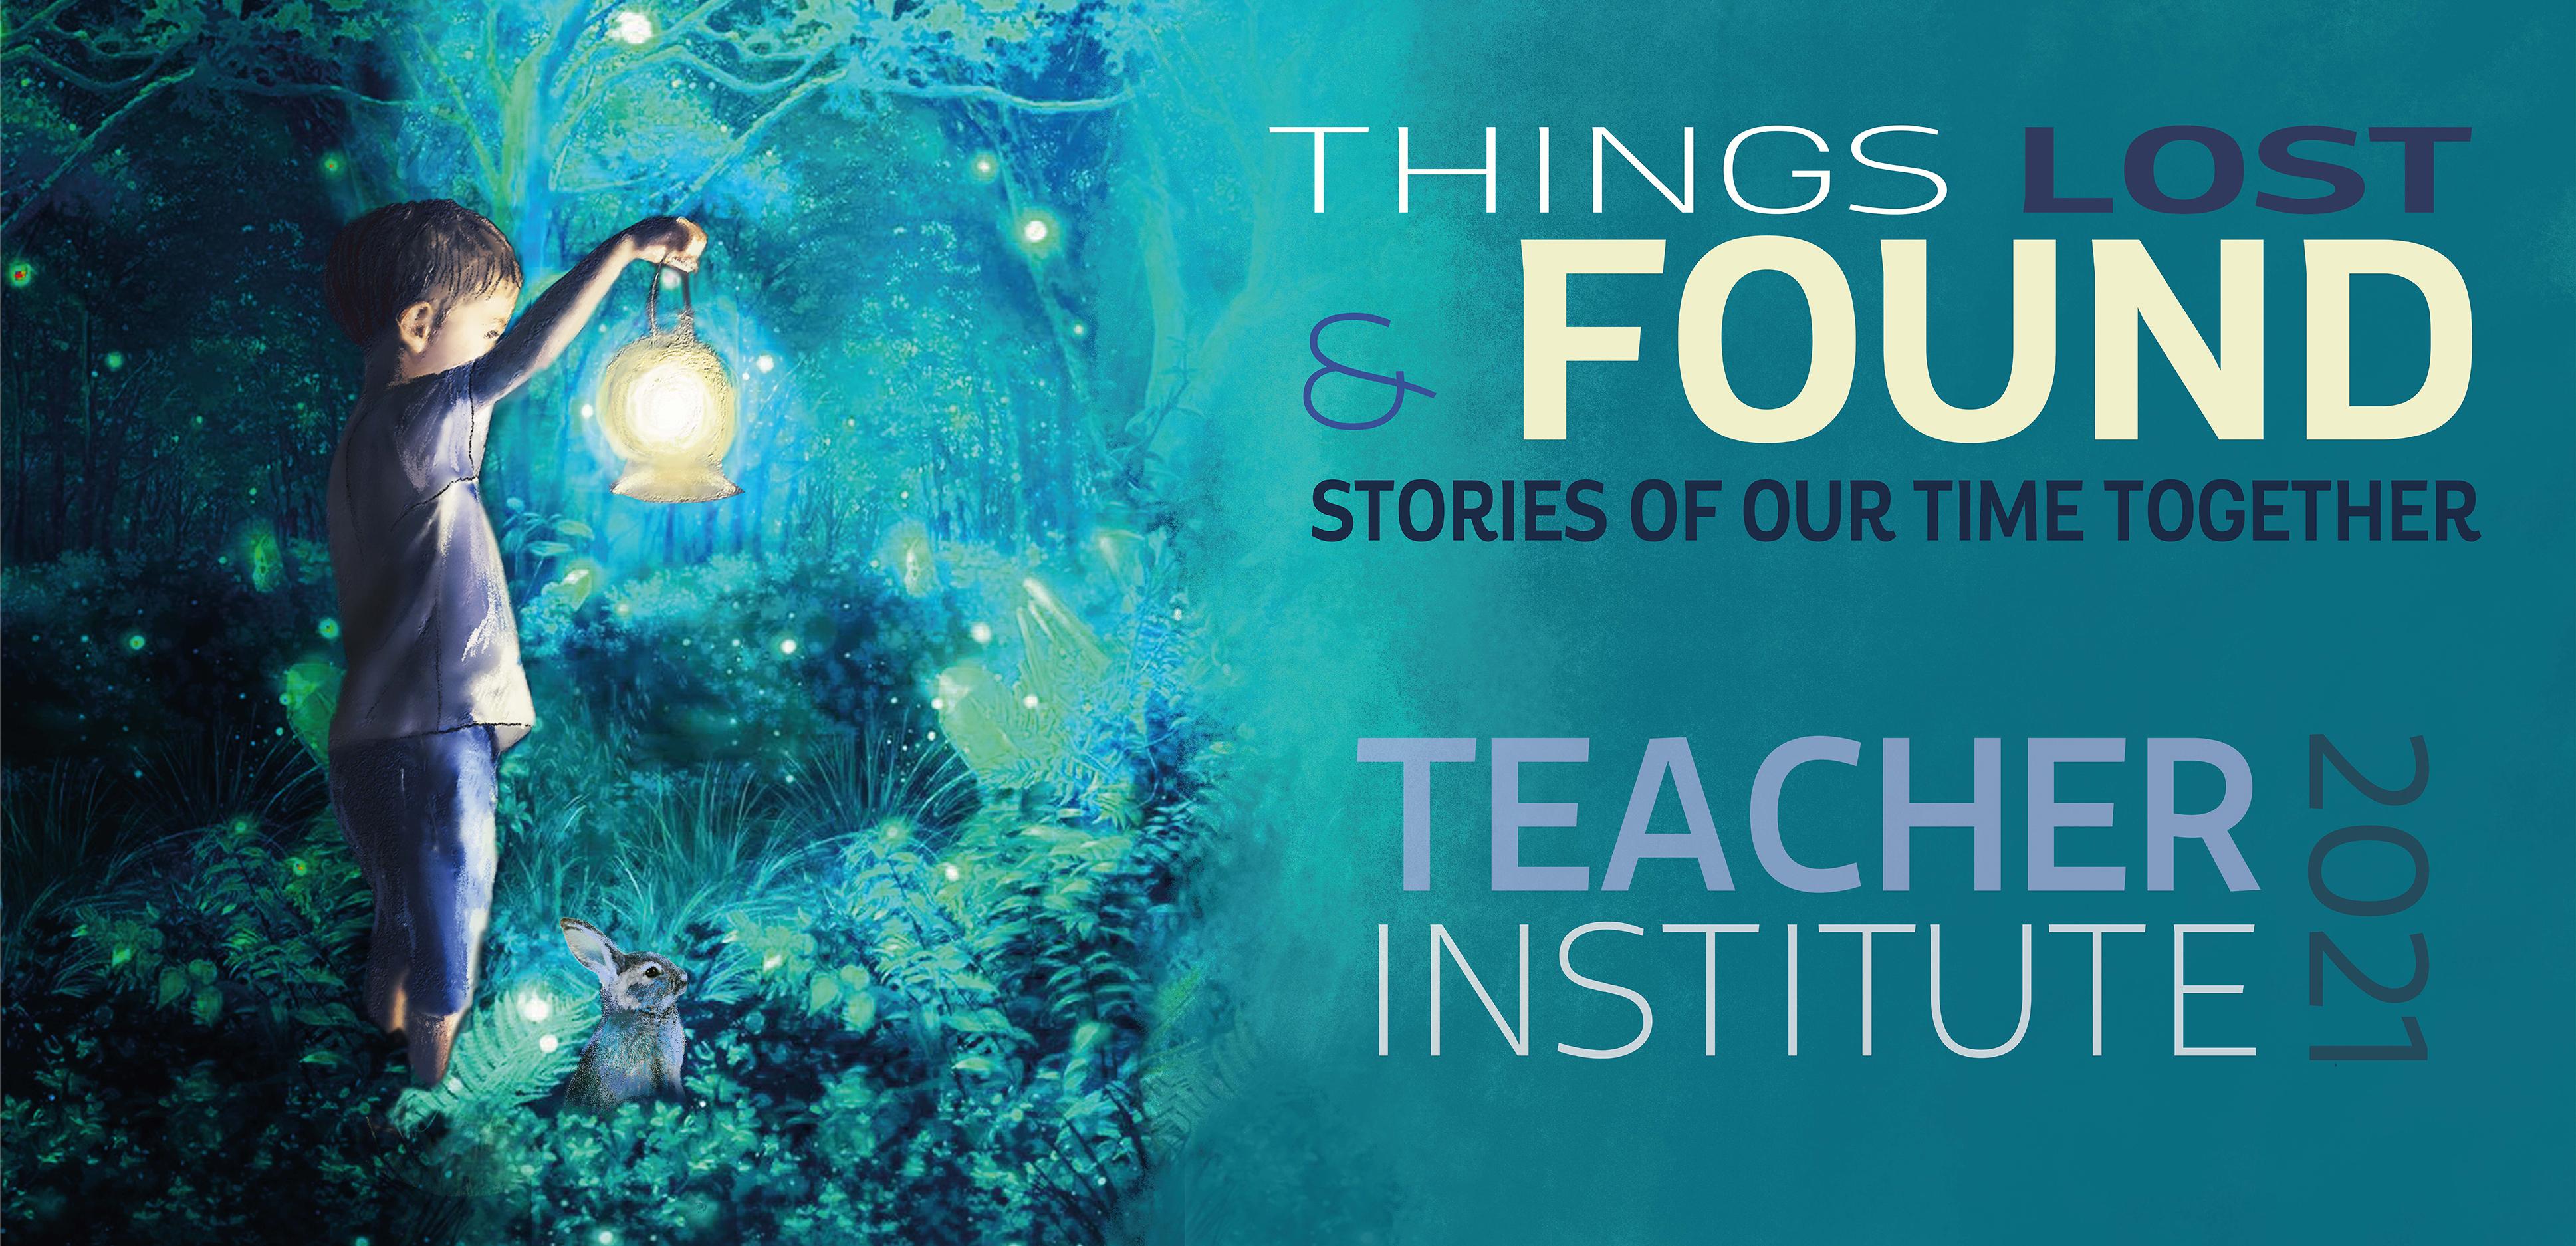 TeacherInst2021c